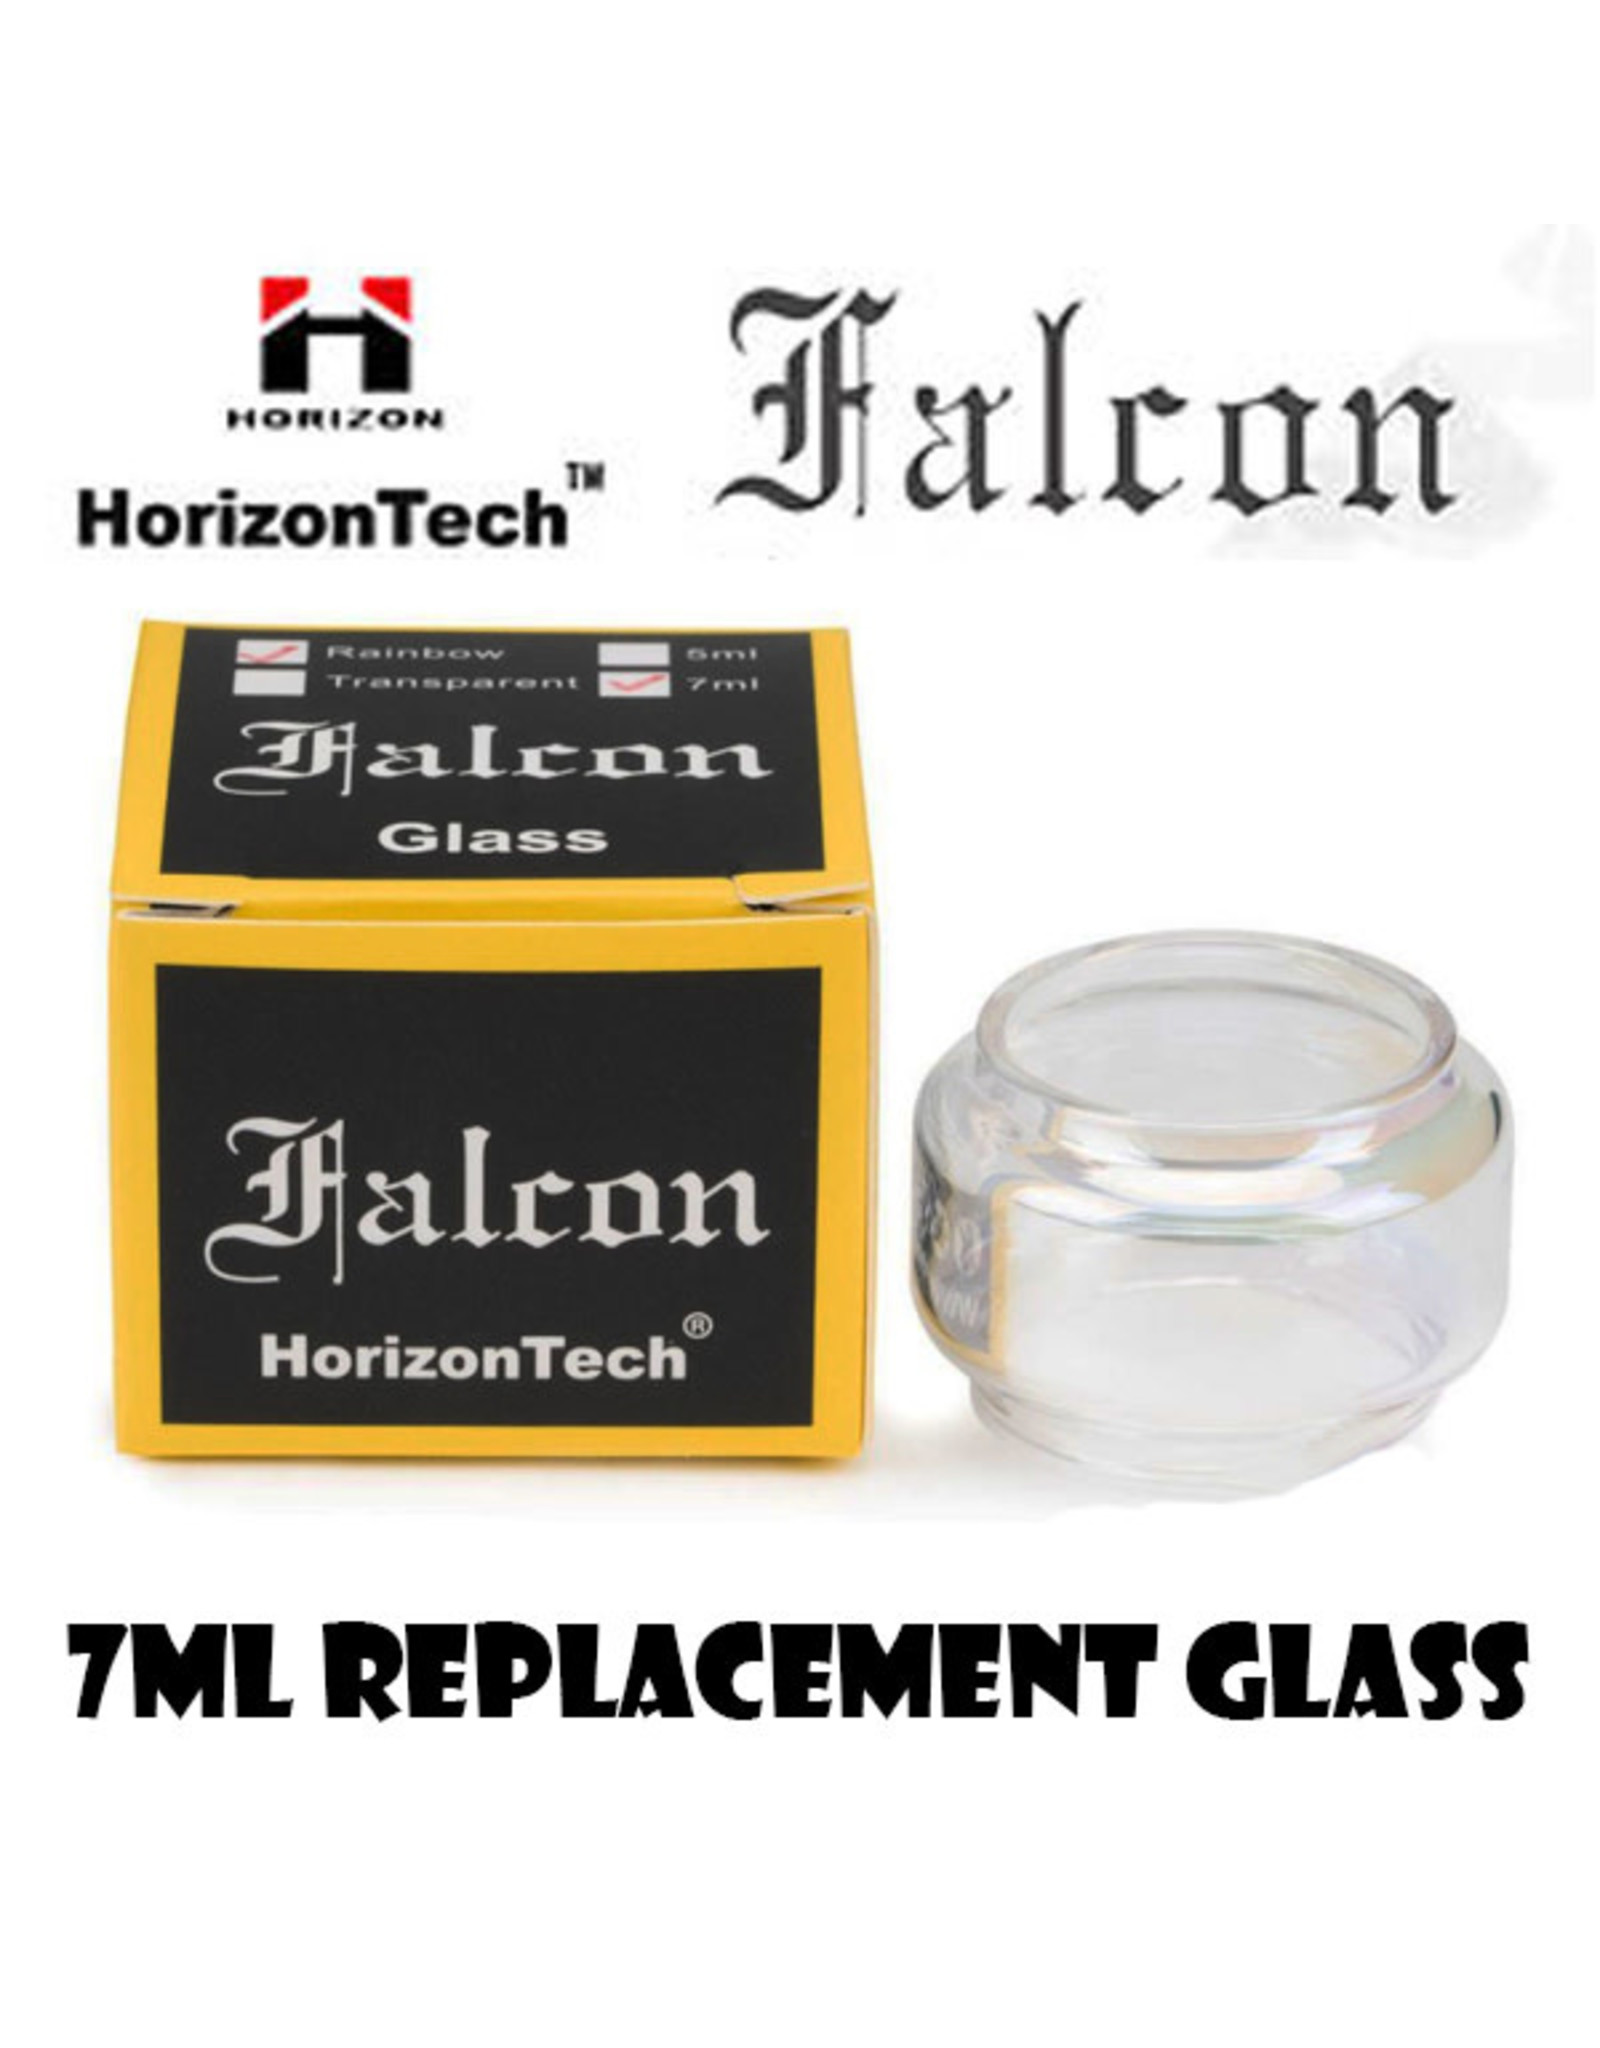 Horizon HorizonTech Falcon / King 7ML Replacement Bubble Glass